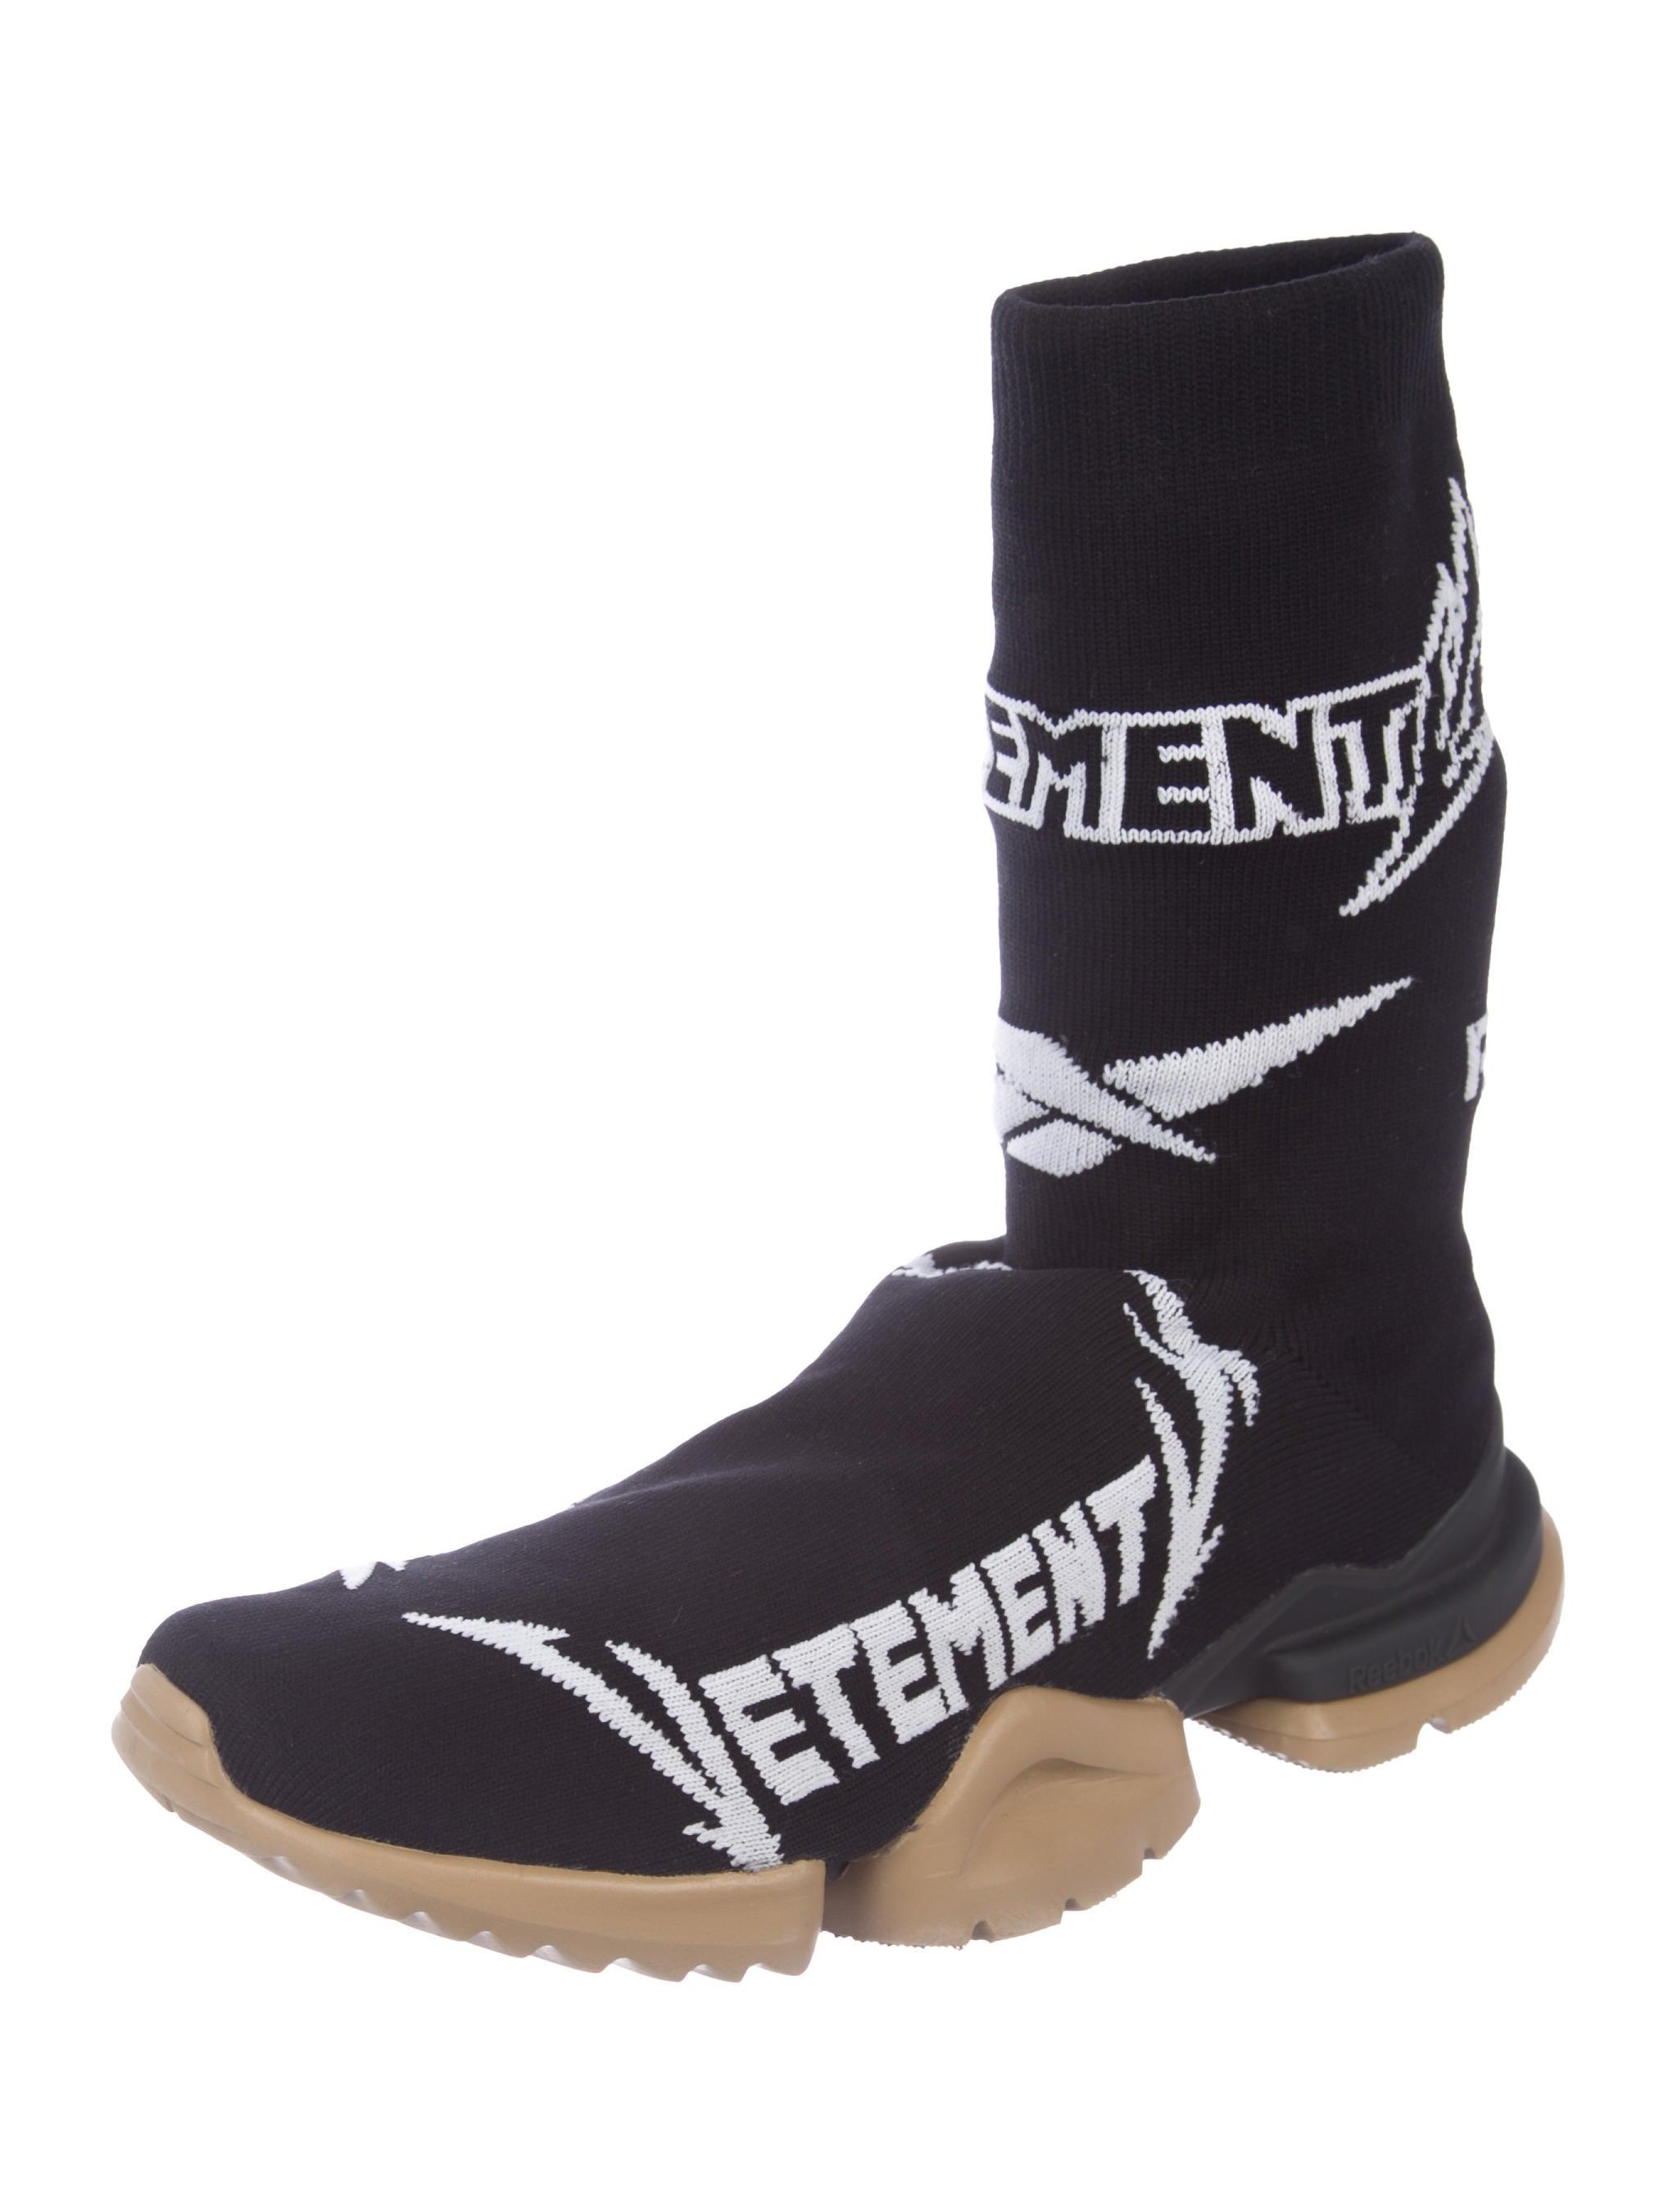 Vetements Vetements x Reebok 2018 Sock Trainer Sneakers